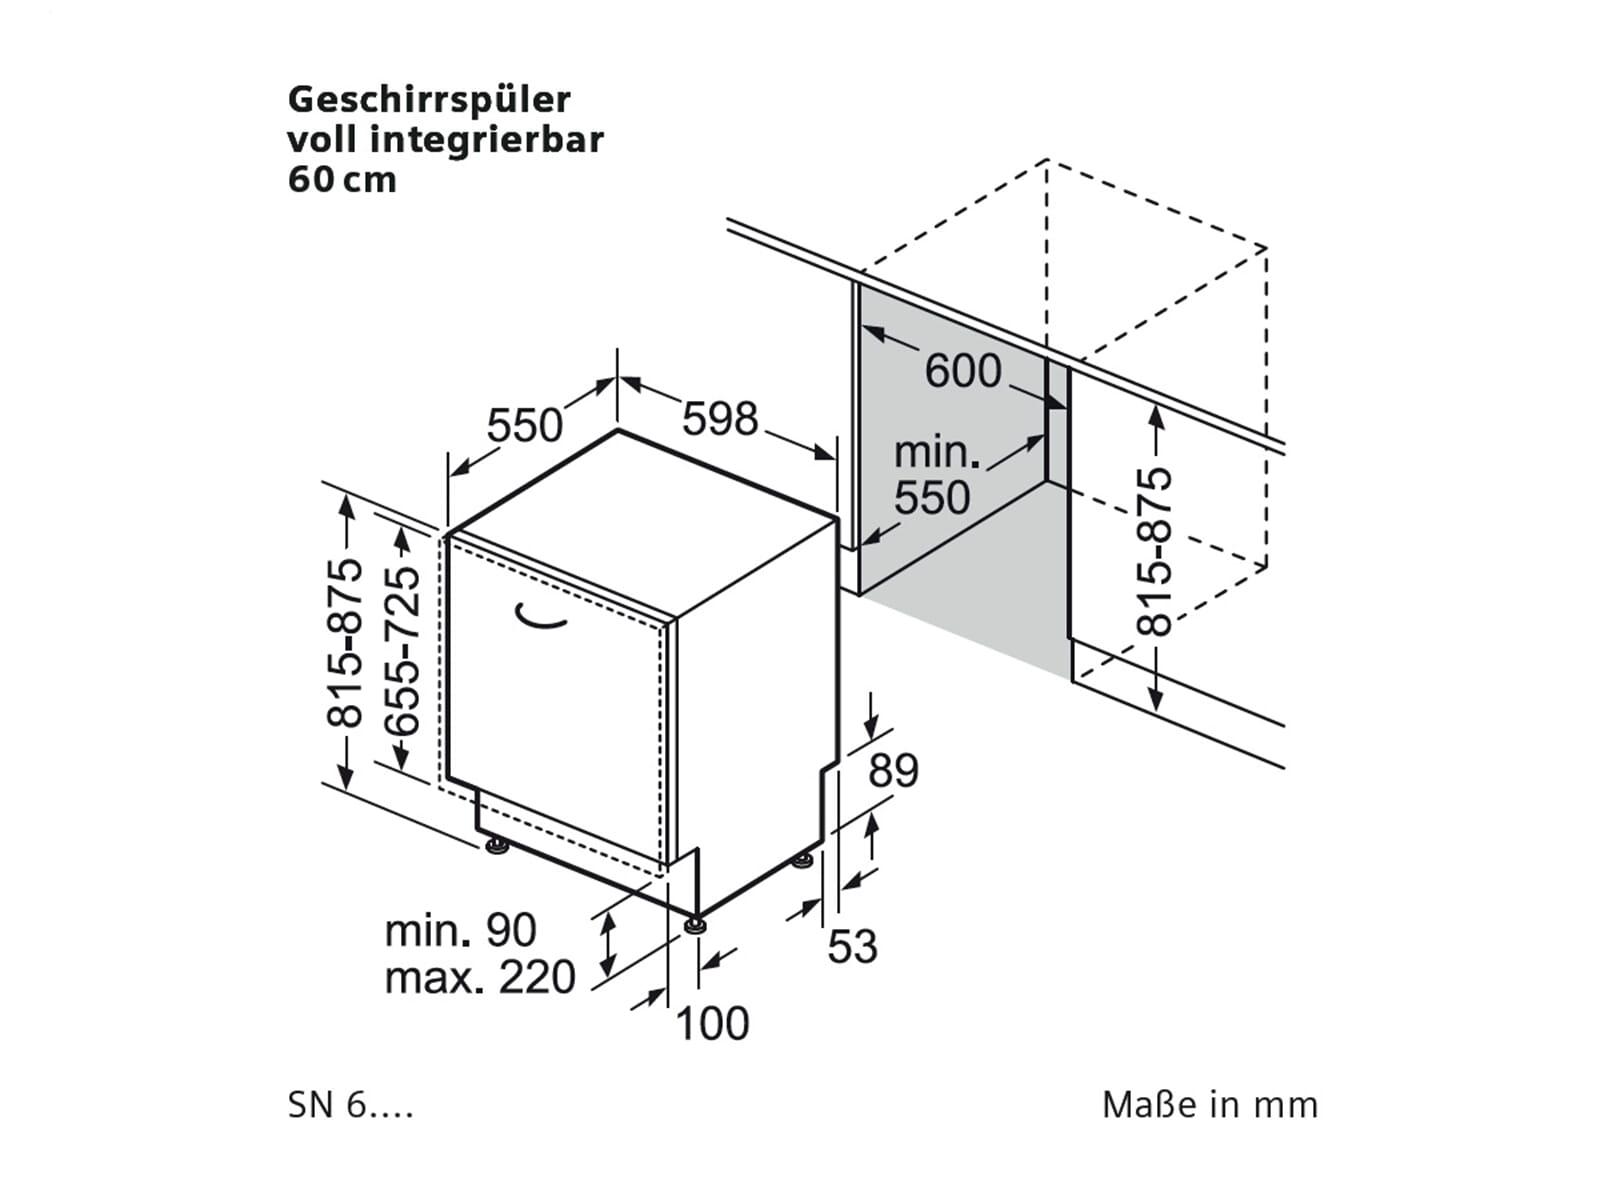 siemens sn65e009eu vollintegrierbarer einbau geschirrsp ler a sp lmaschine 10l ebay. Black Bedroom Furniture Sets. Home Design Ideas